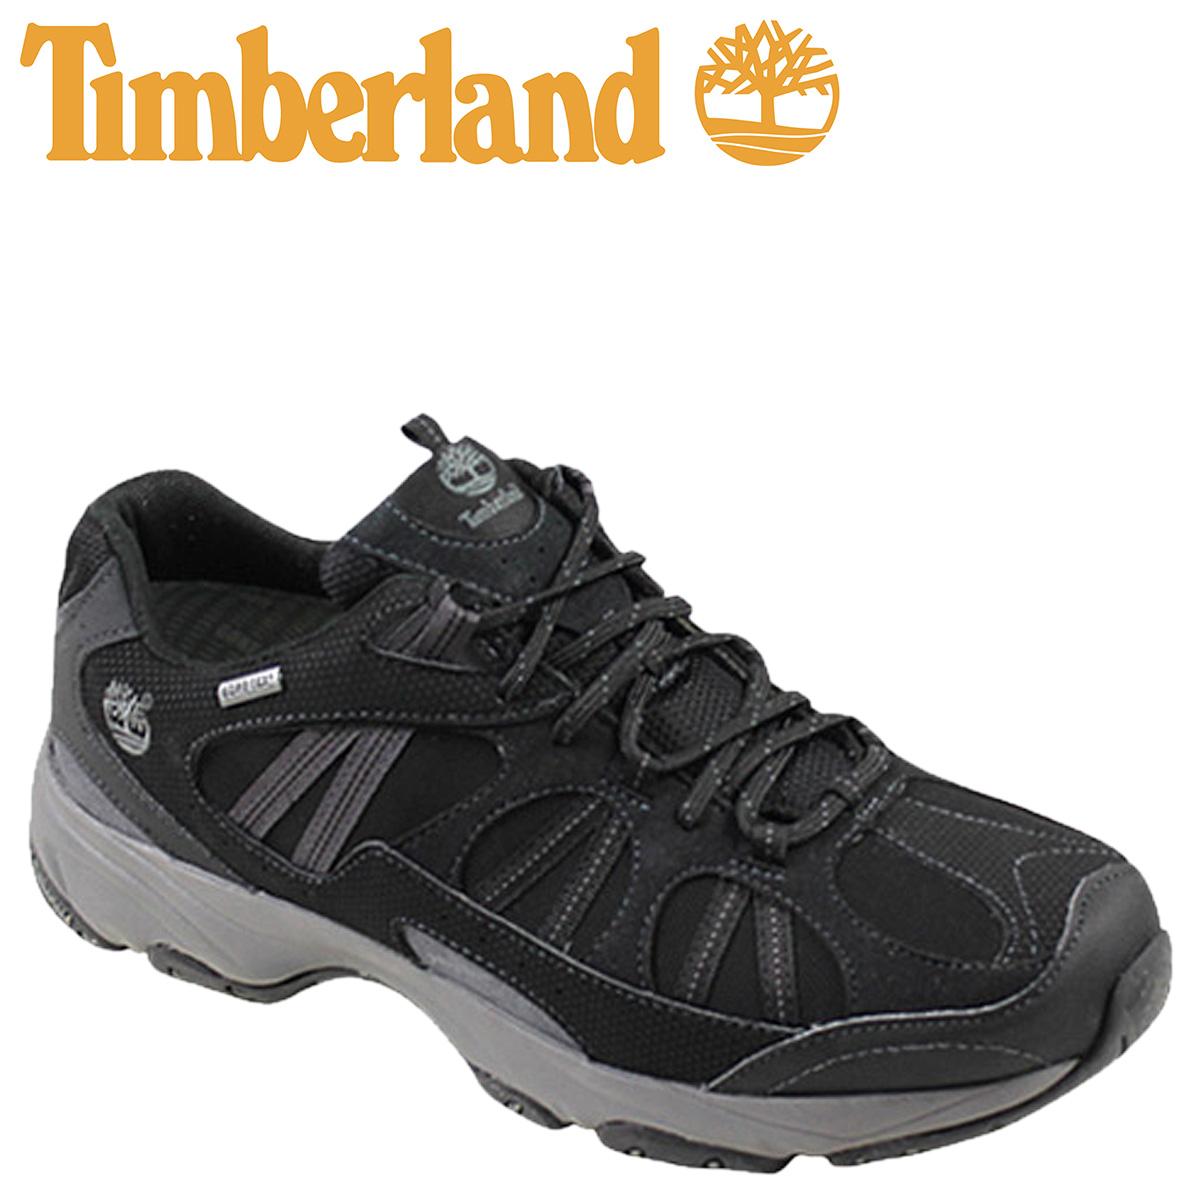 Light 94106 Men Translite Tex Sneakers Timberland Gore Black Low Trance uPXiOZk